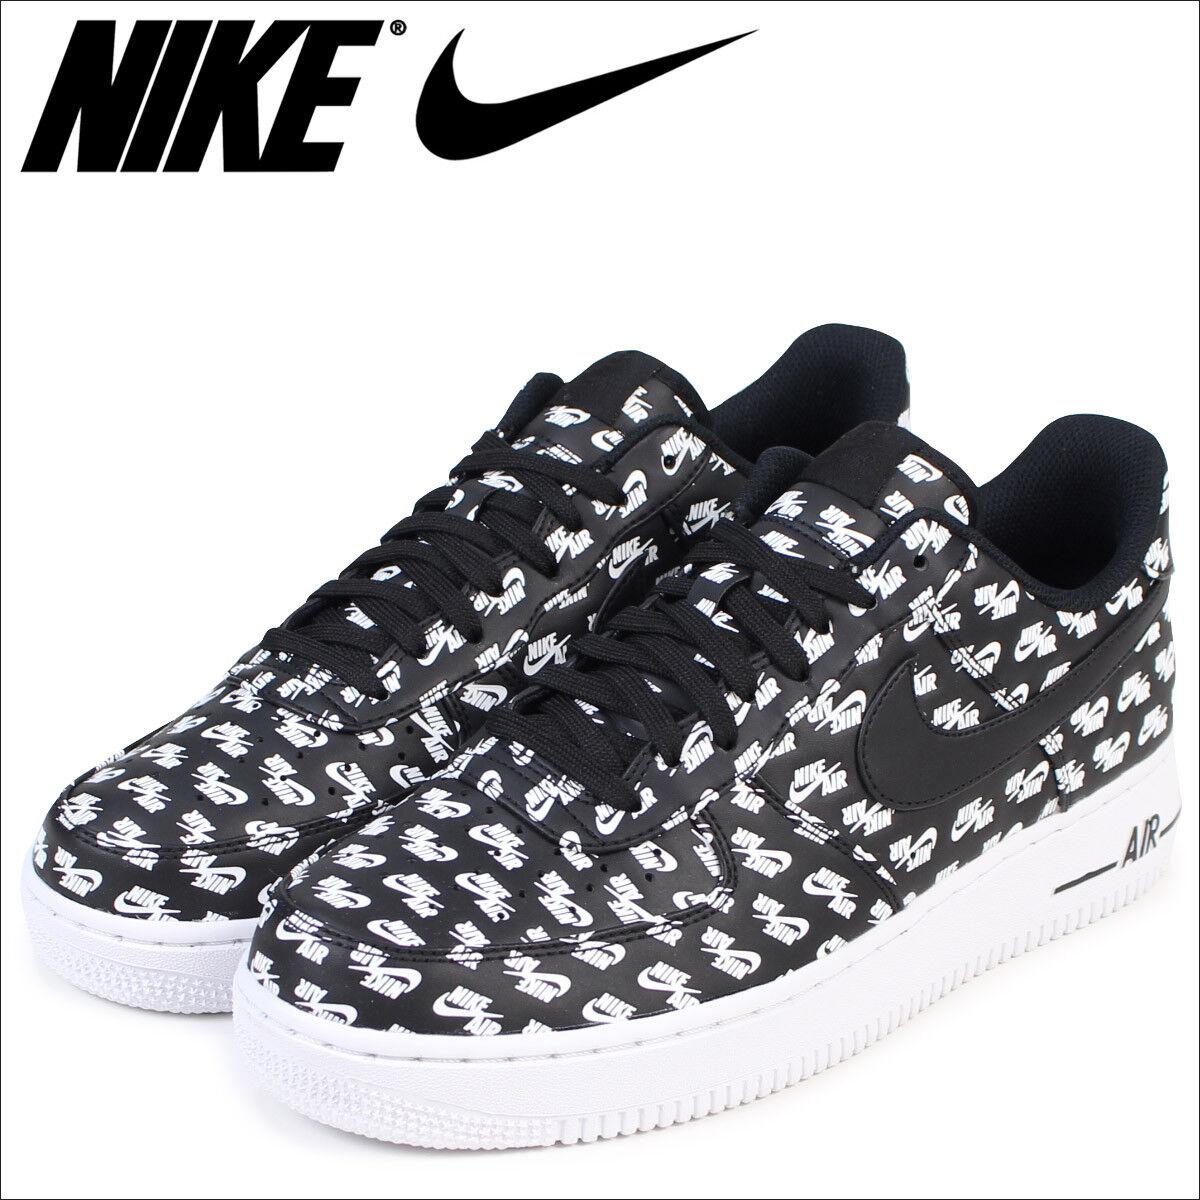 Nike air force 1 basso 07 qs sul logo pack neri e bianchi ah8462-001 sz 10 scarpe